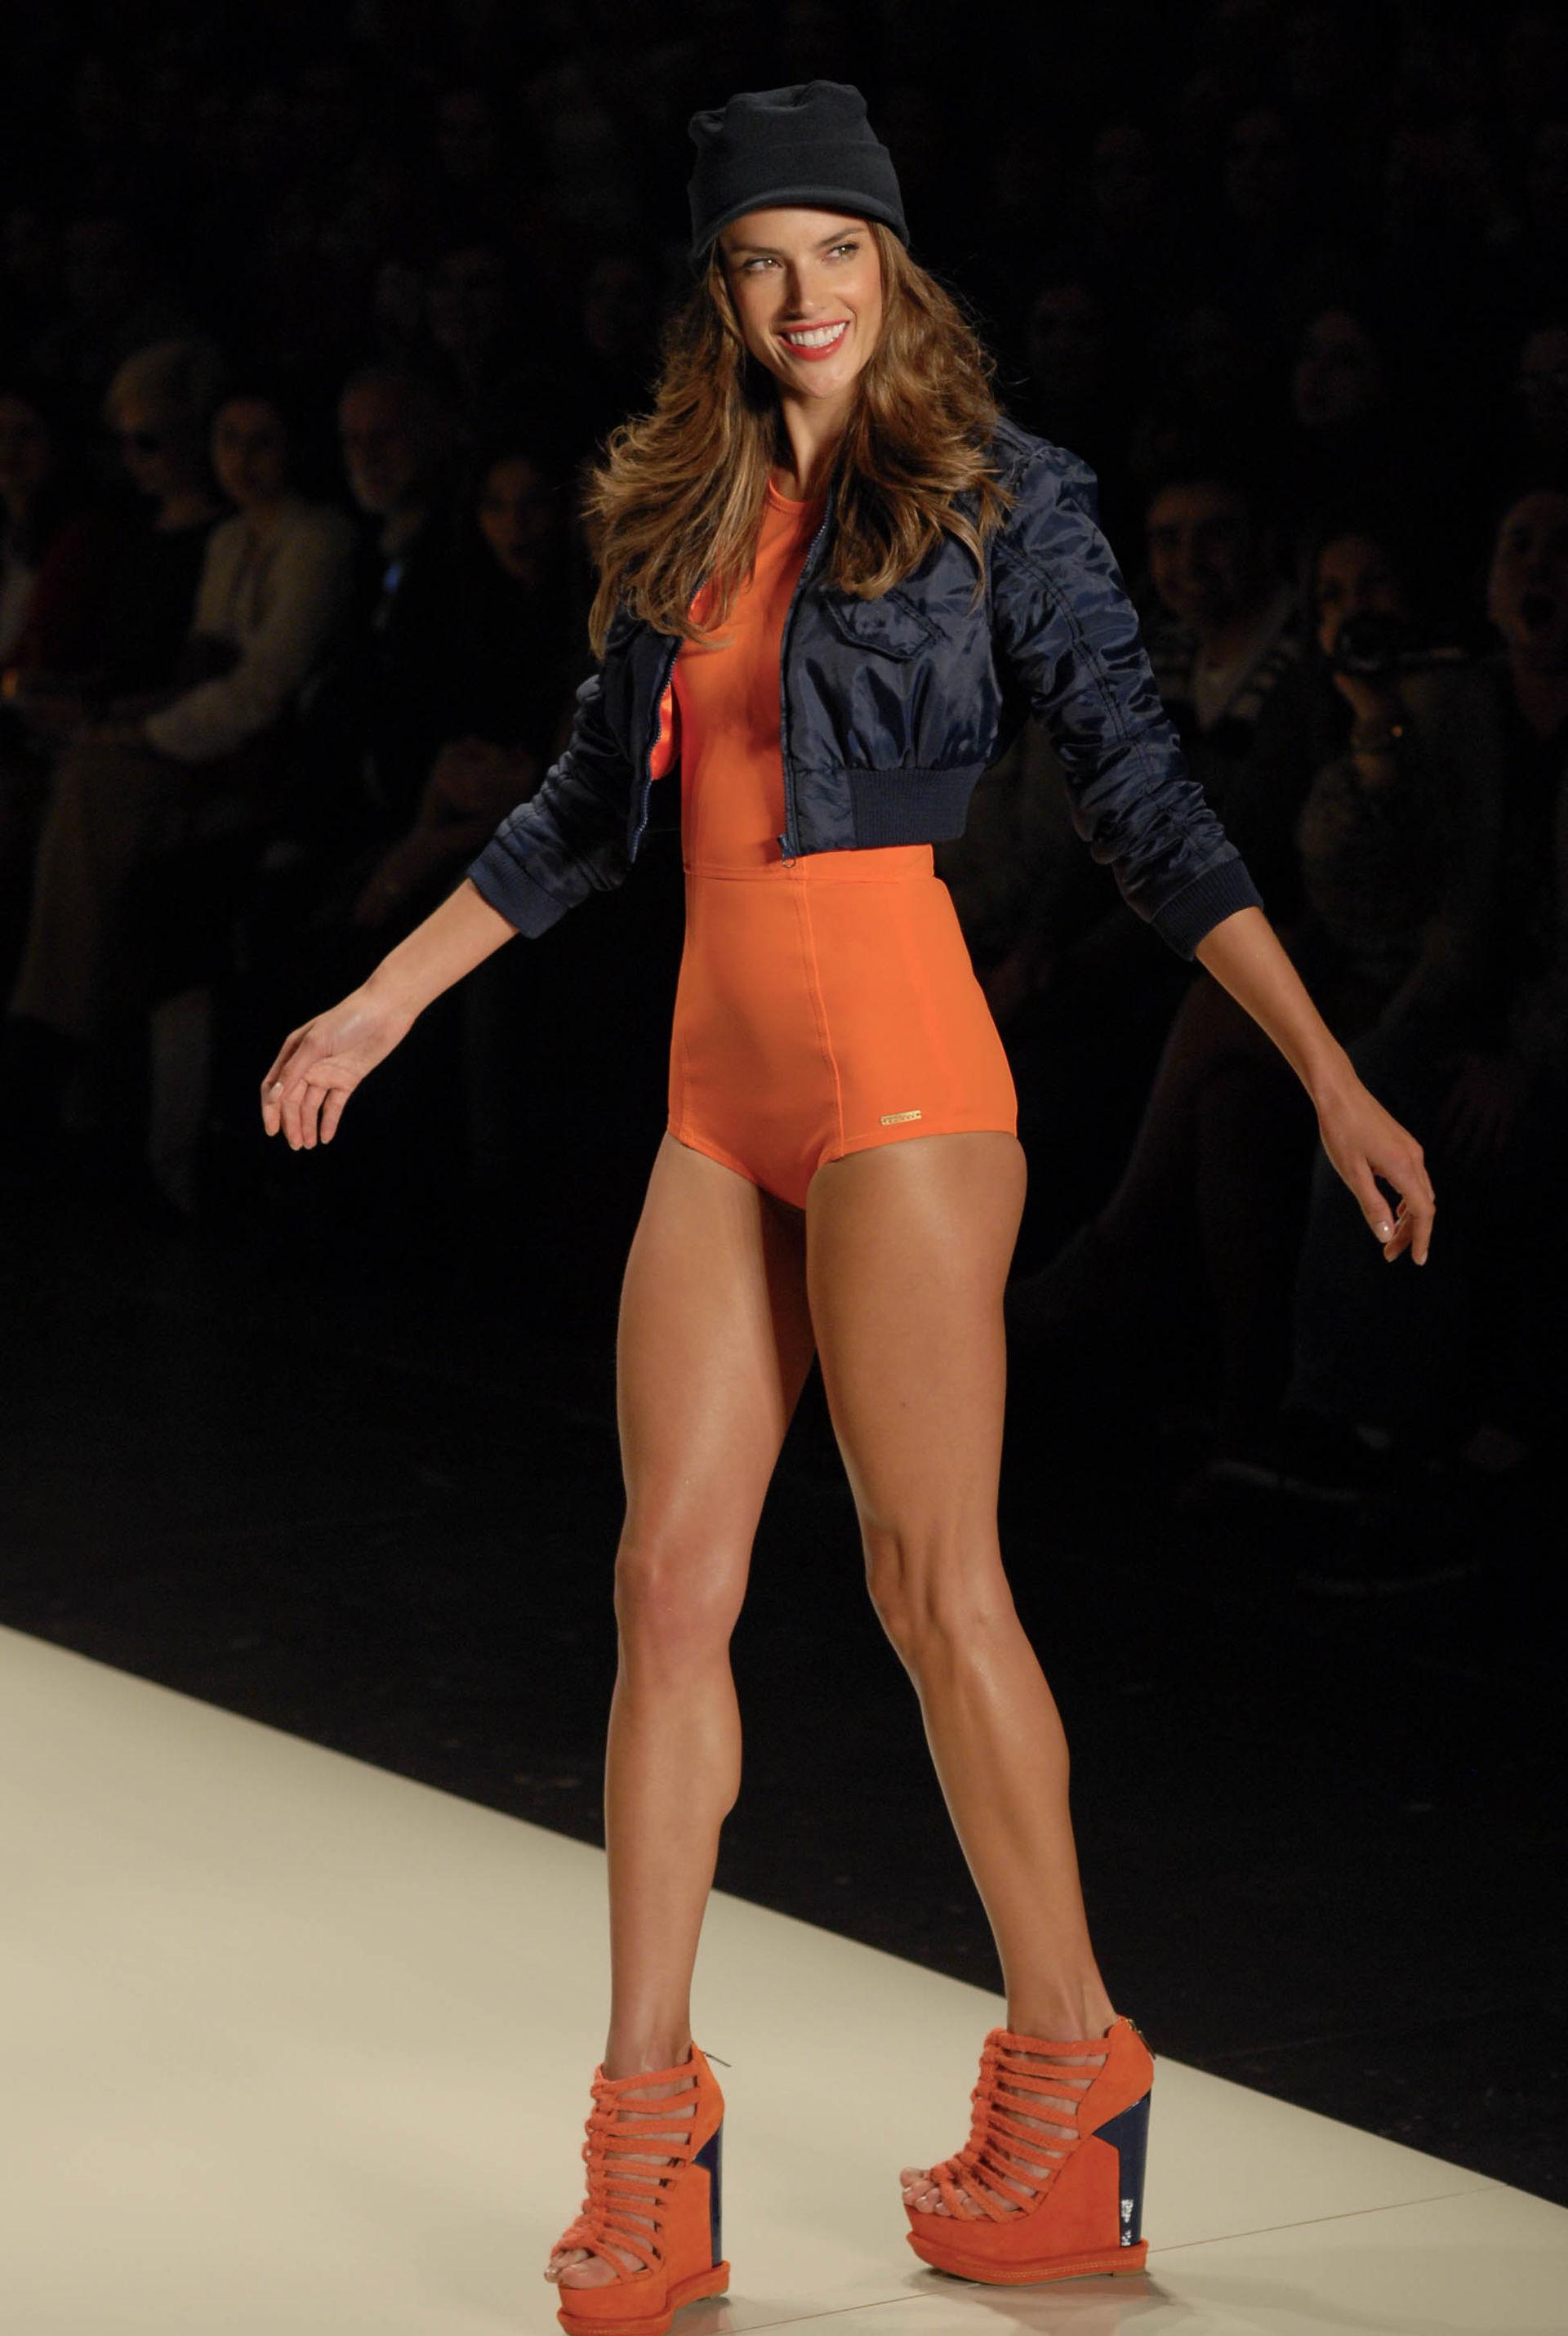 The sims 3 fashion show 42